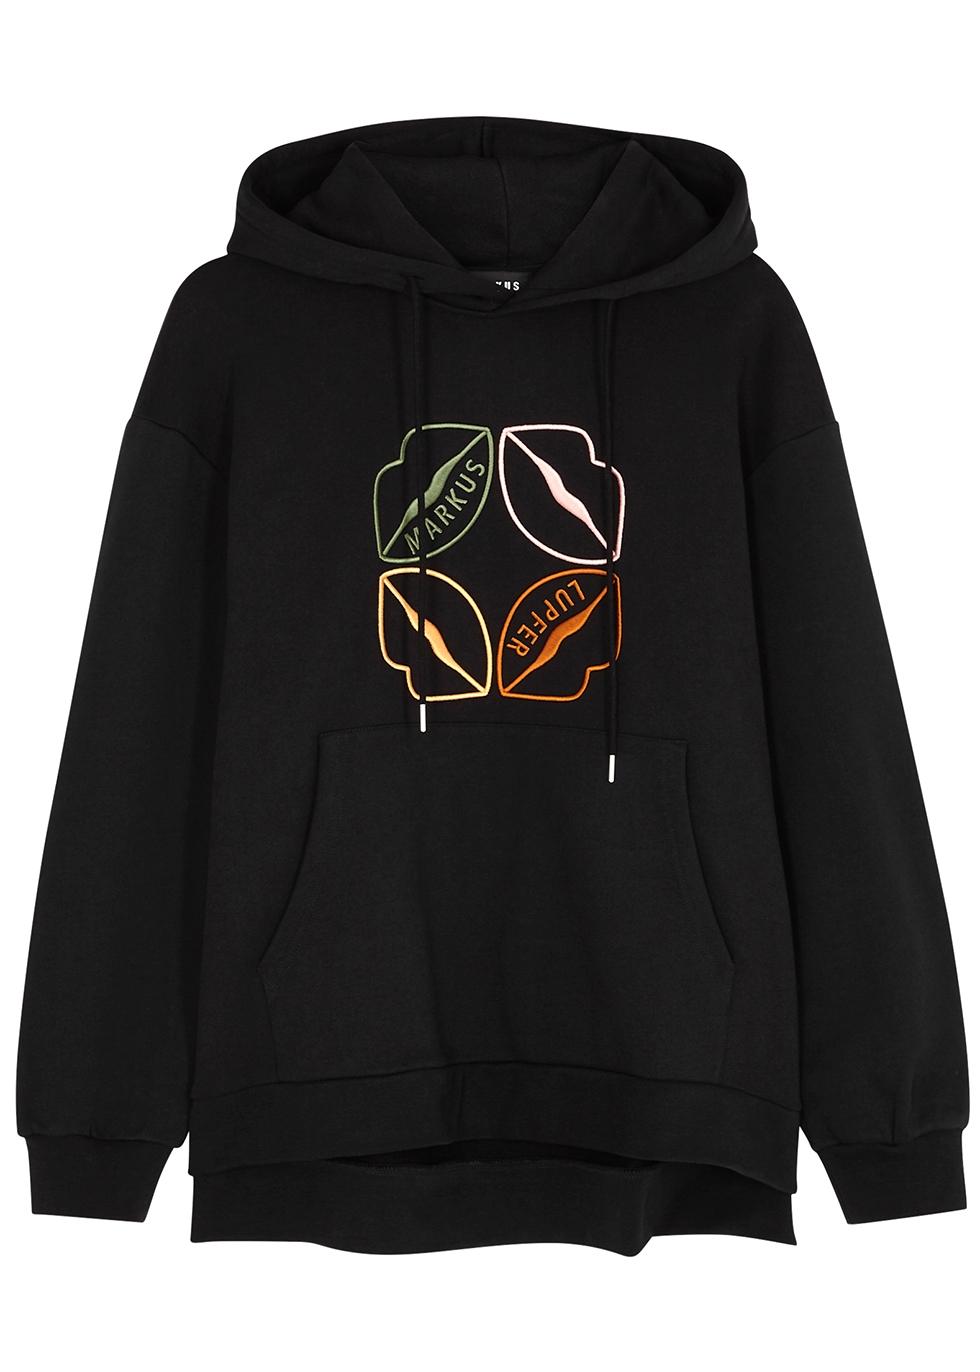 Naomi black embroidered cotton sweatshirt